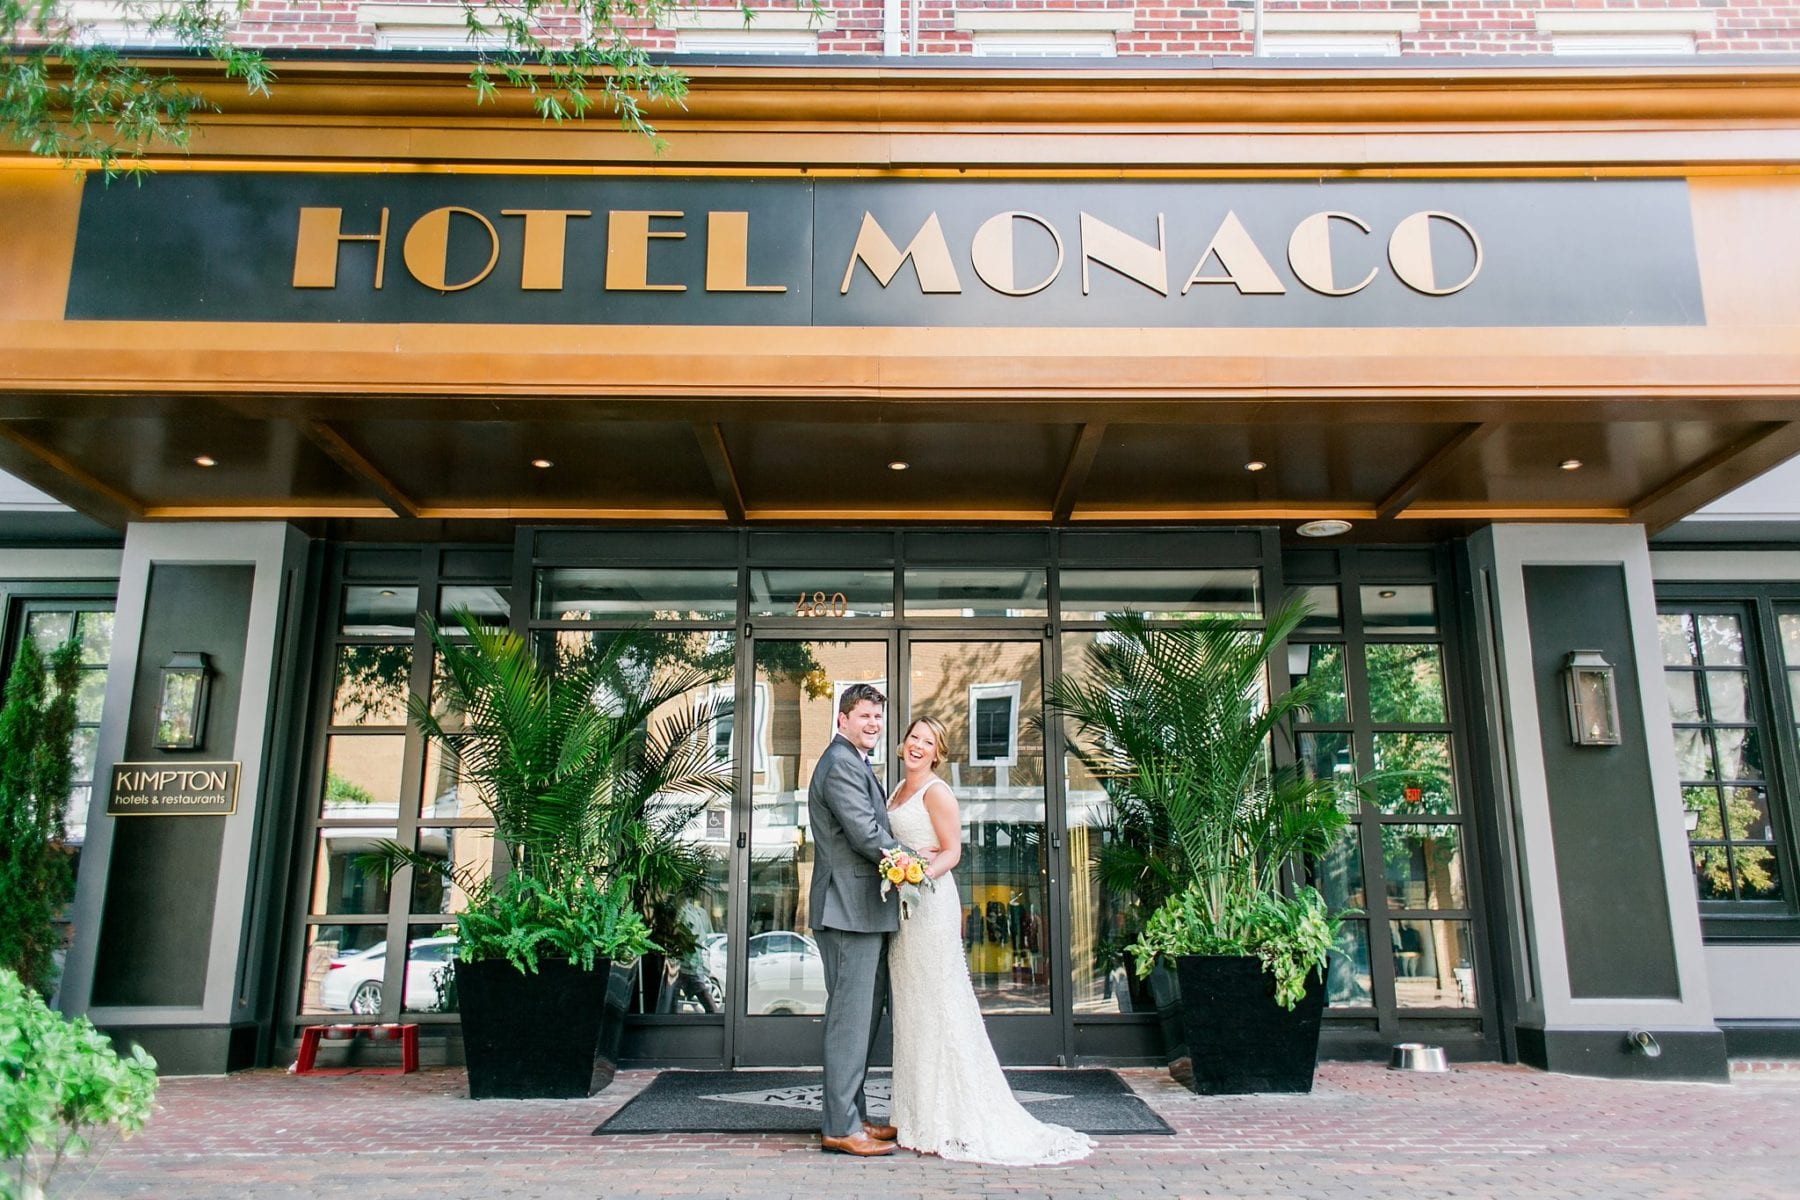 Hotel Monaco Wedding Photos Virginia Wedding Photographer Megan Kelsey Photography Kevin & Morgan-259.JPG